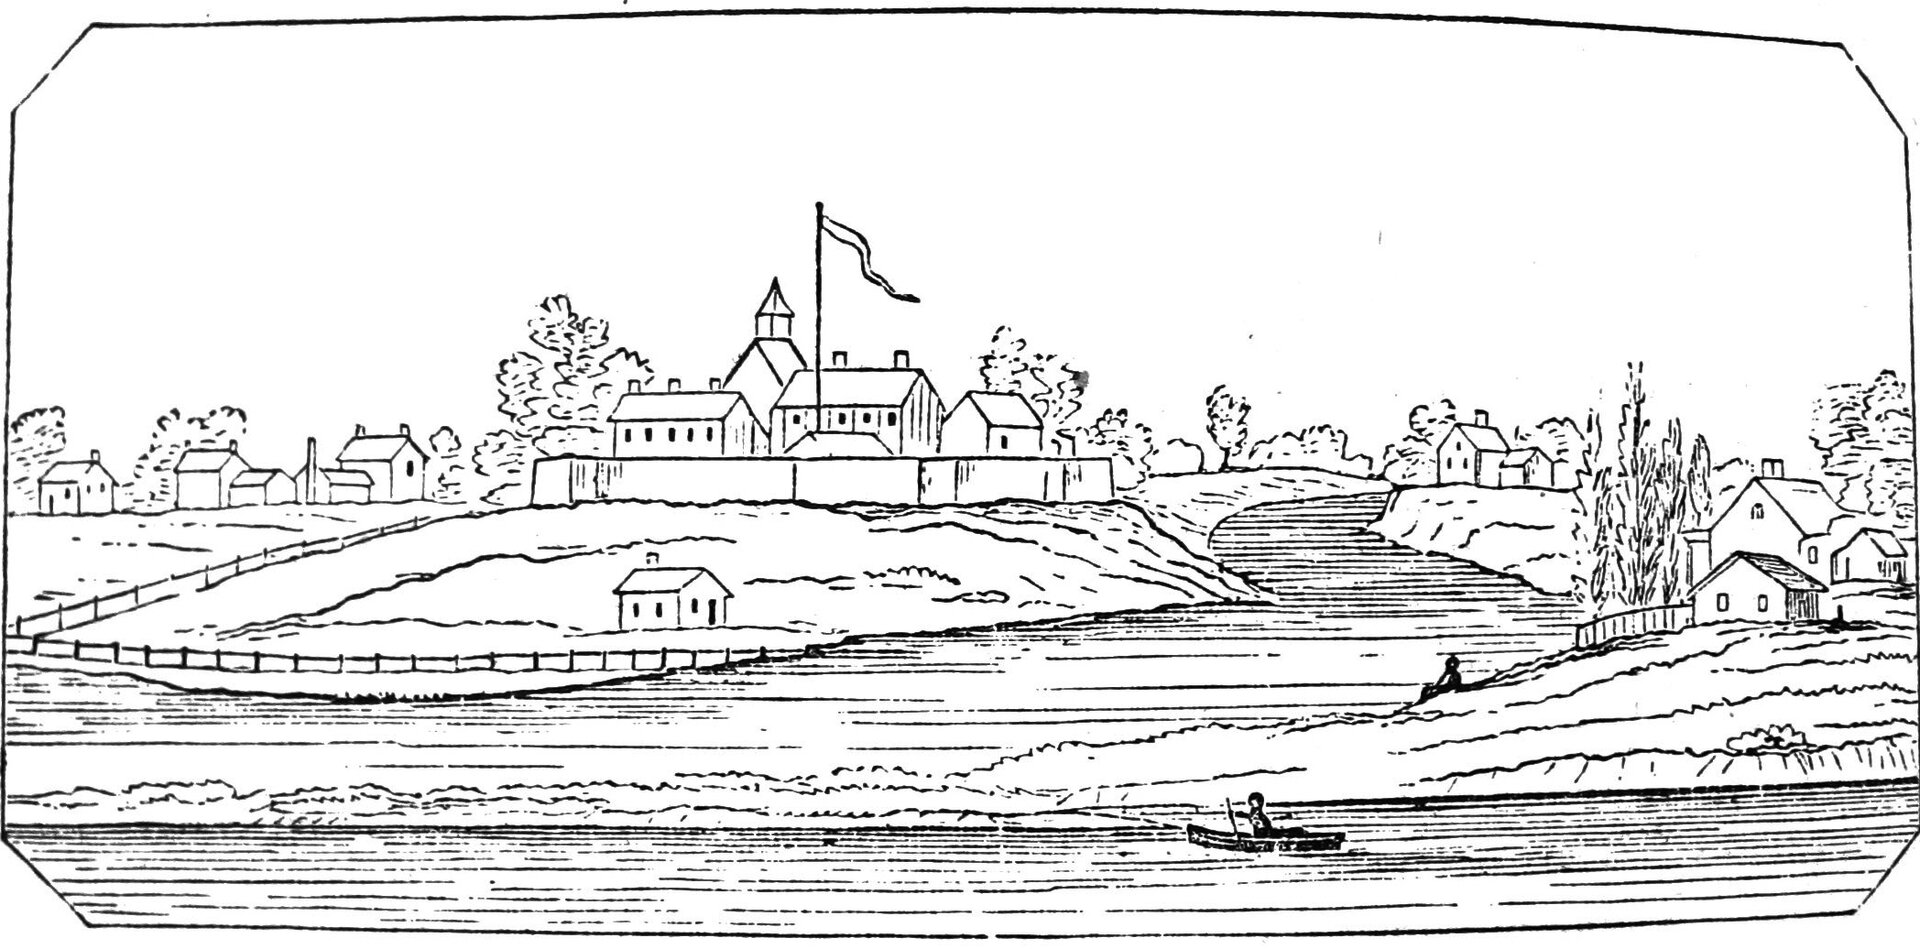 Fort Dearborn Fort Dearborn. Ilustracja zXIXwieku Źródło: Barber and Howe, Fort Dearborn, domena publiczna.